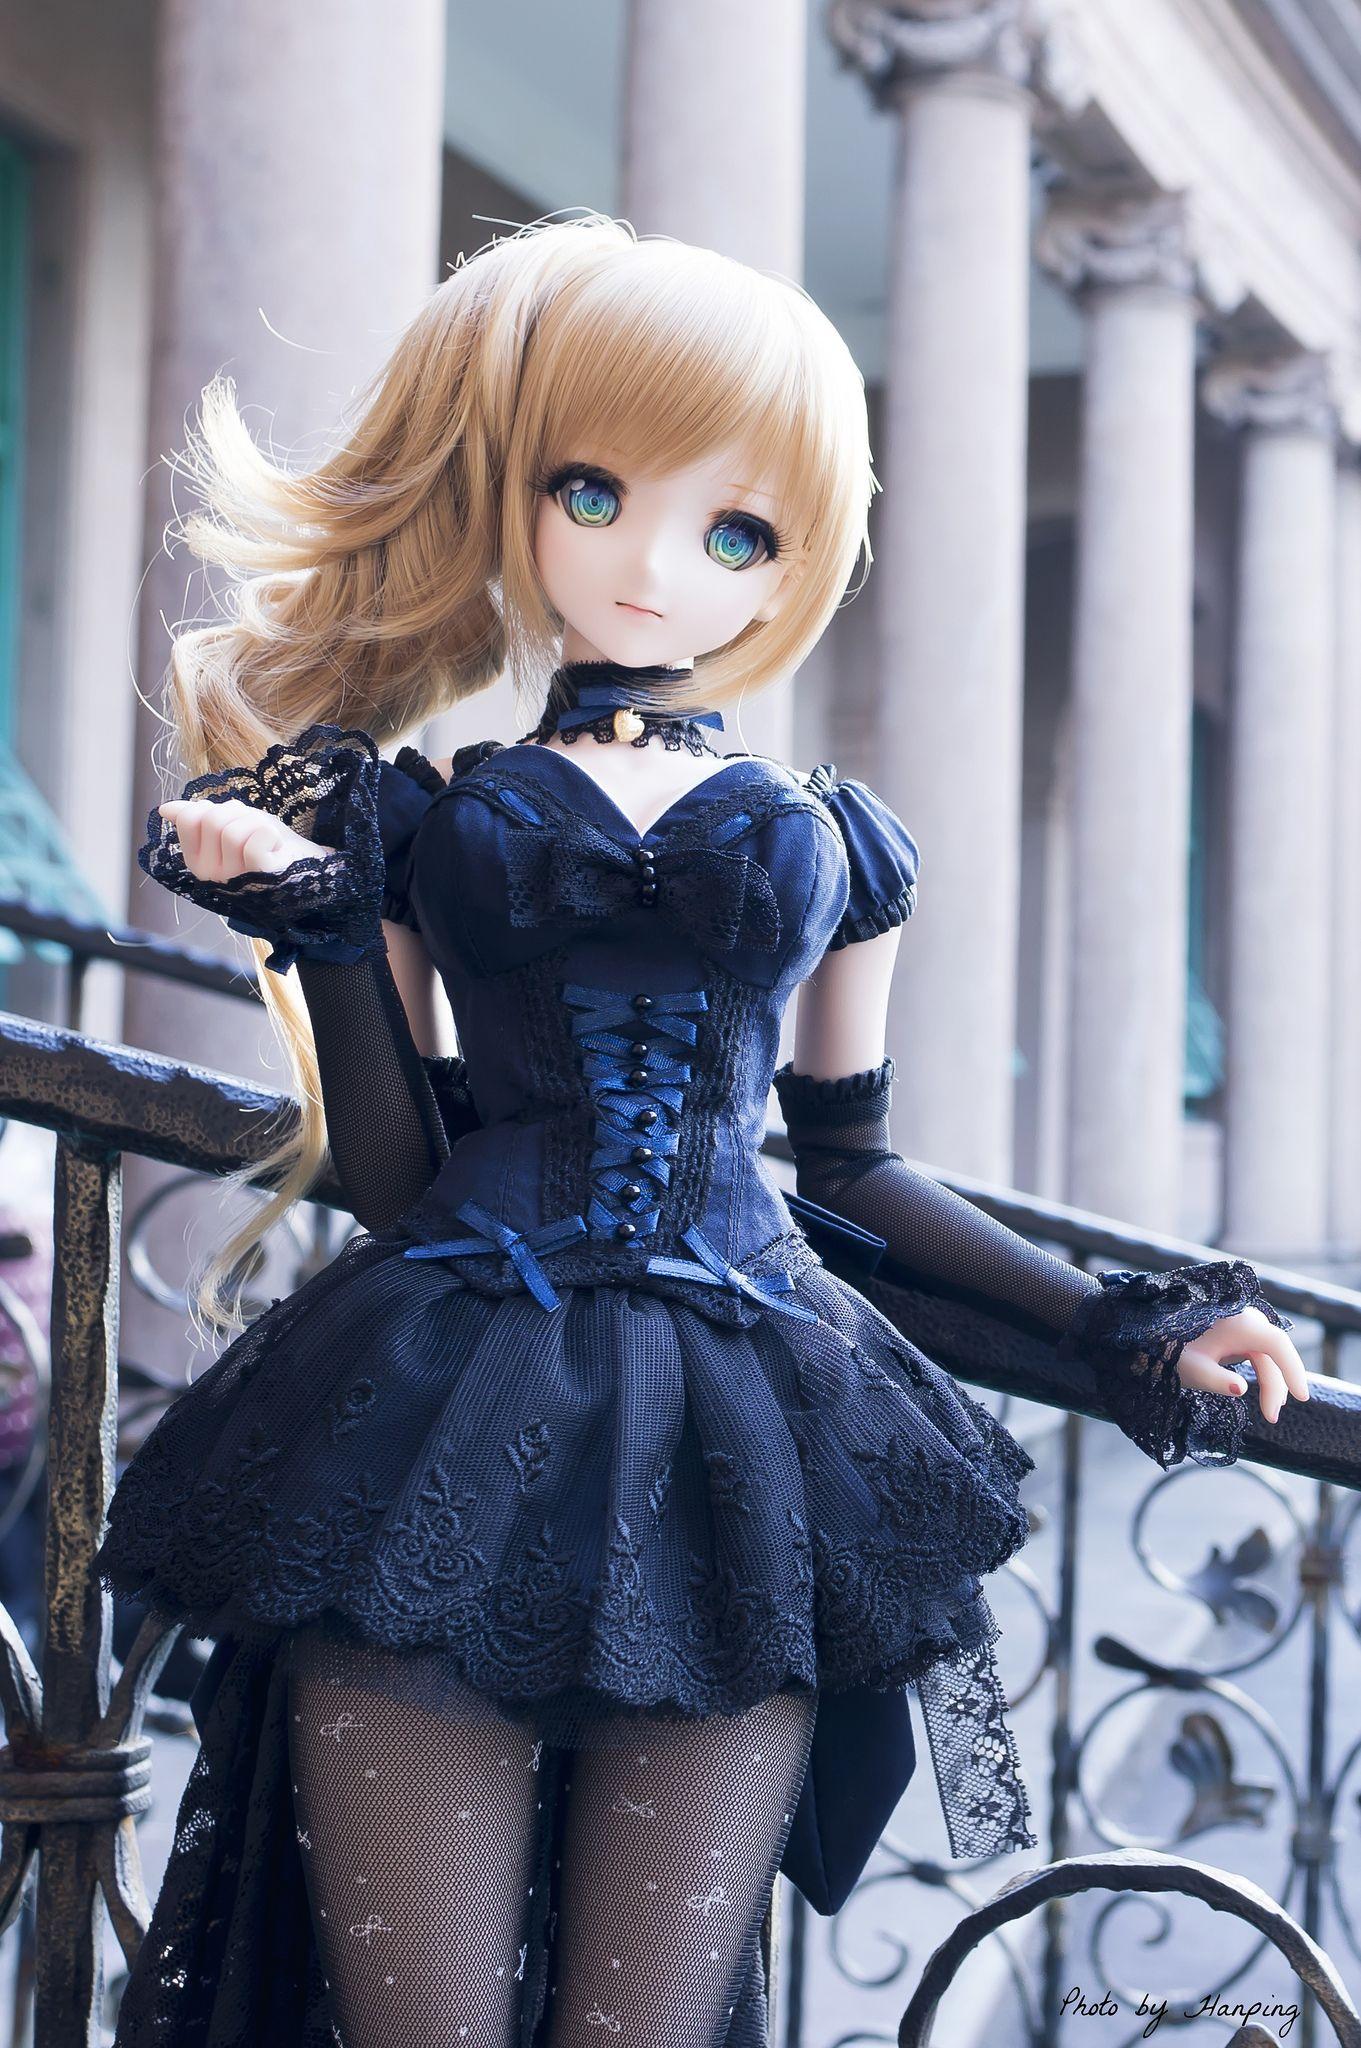 Https flic kr p ka4yrq 巴洛克 anime dolls